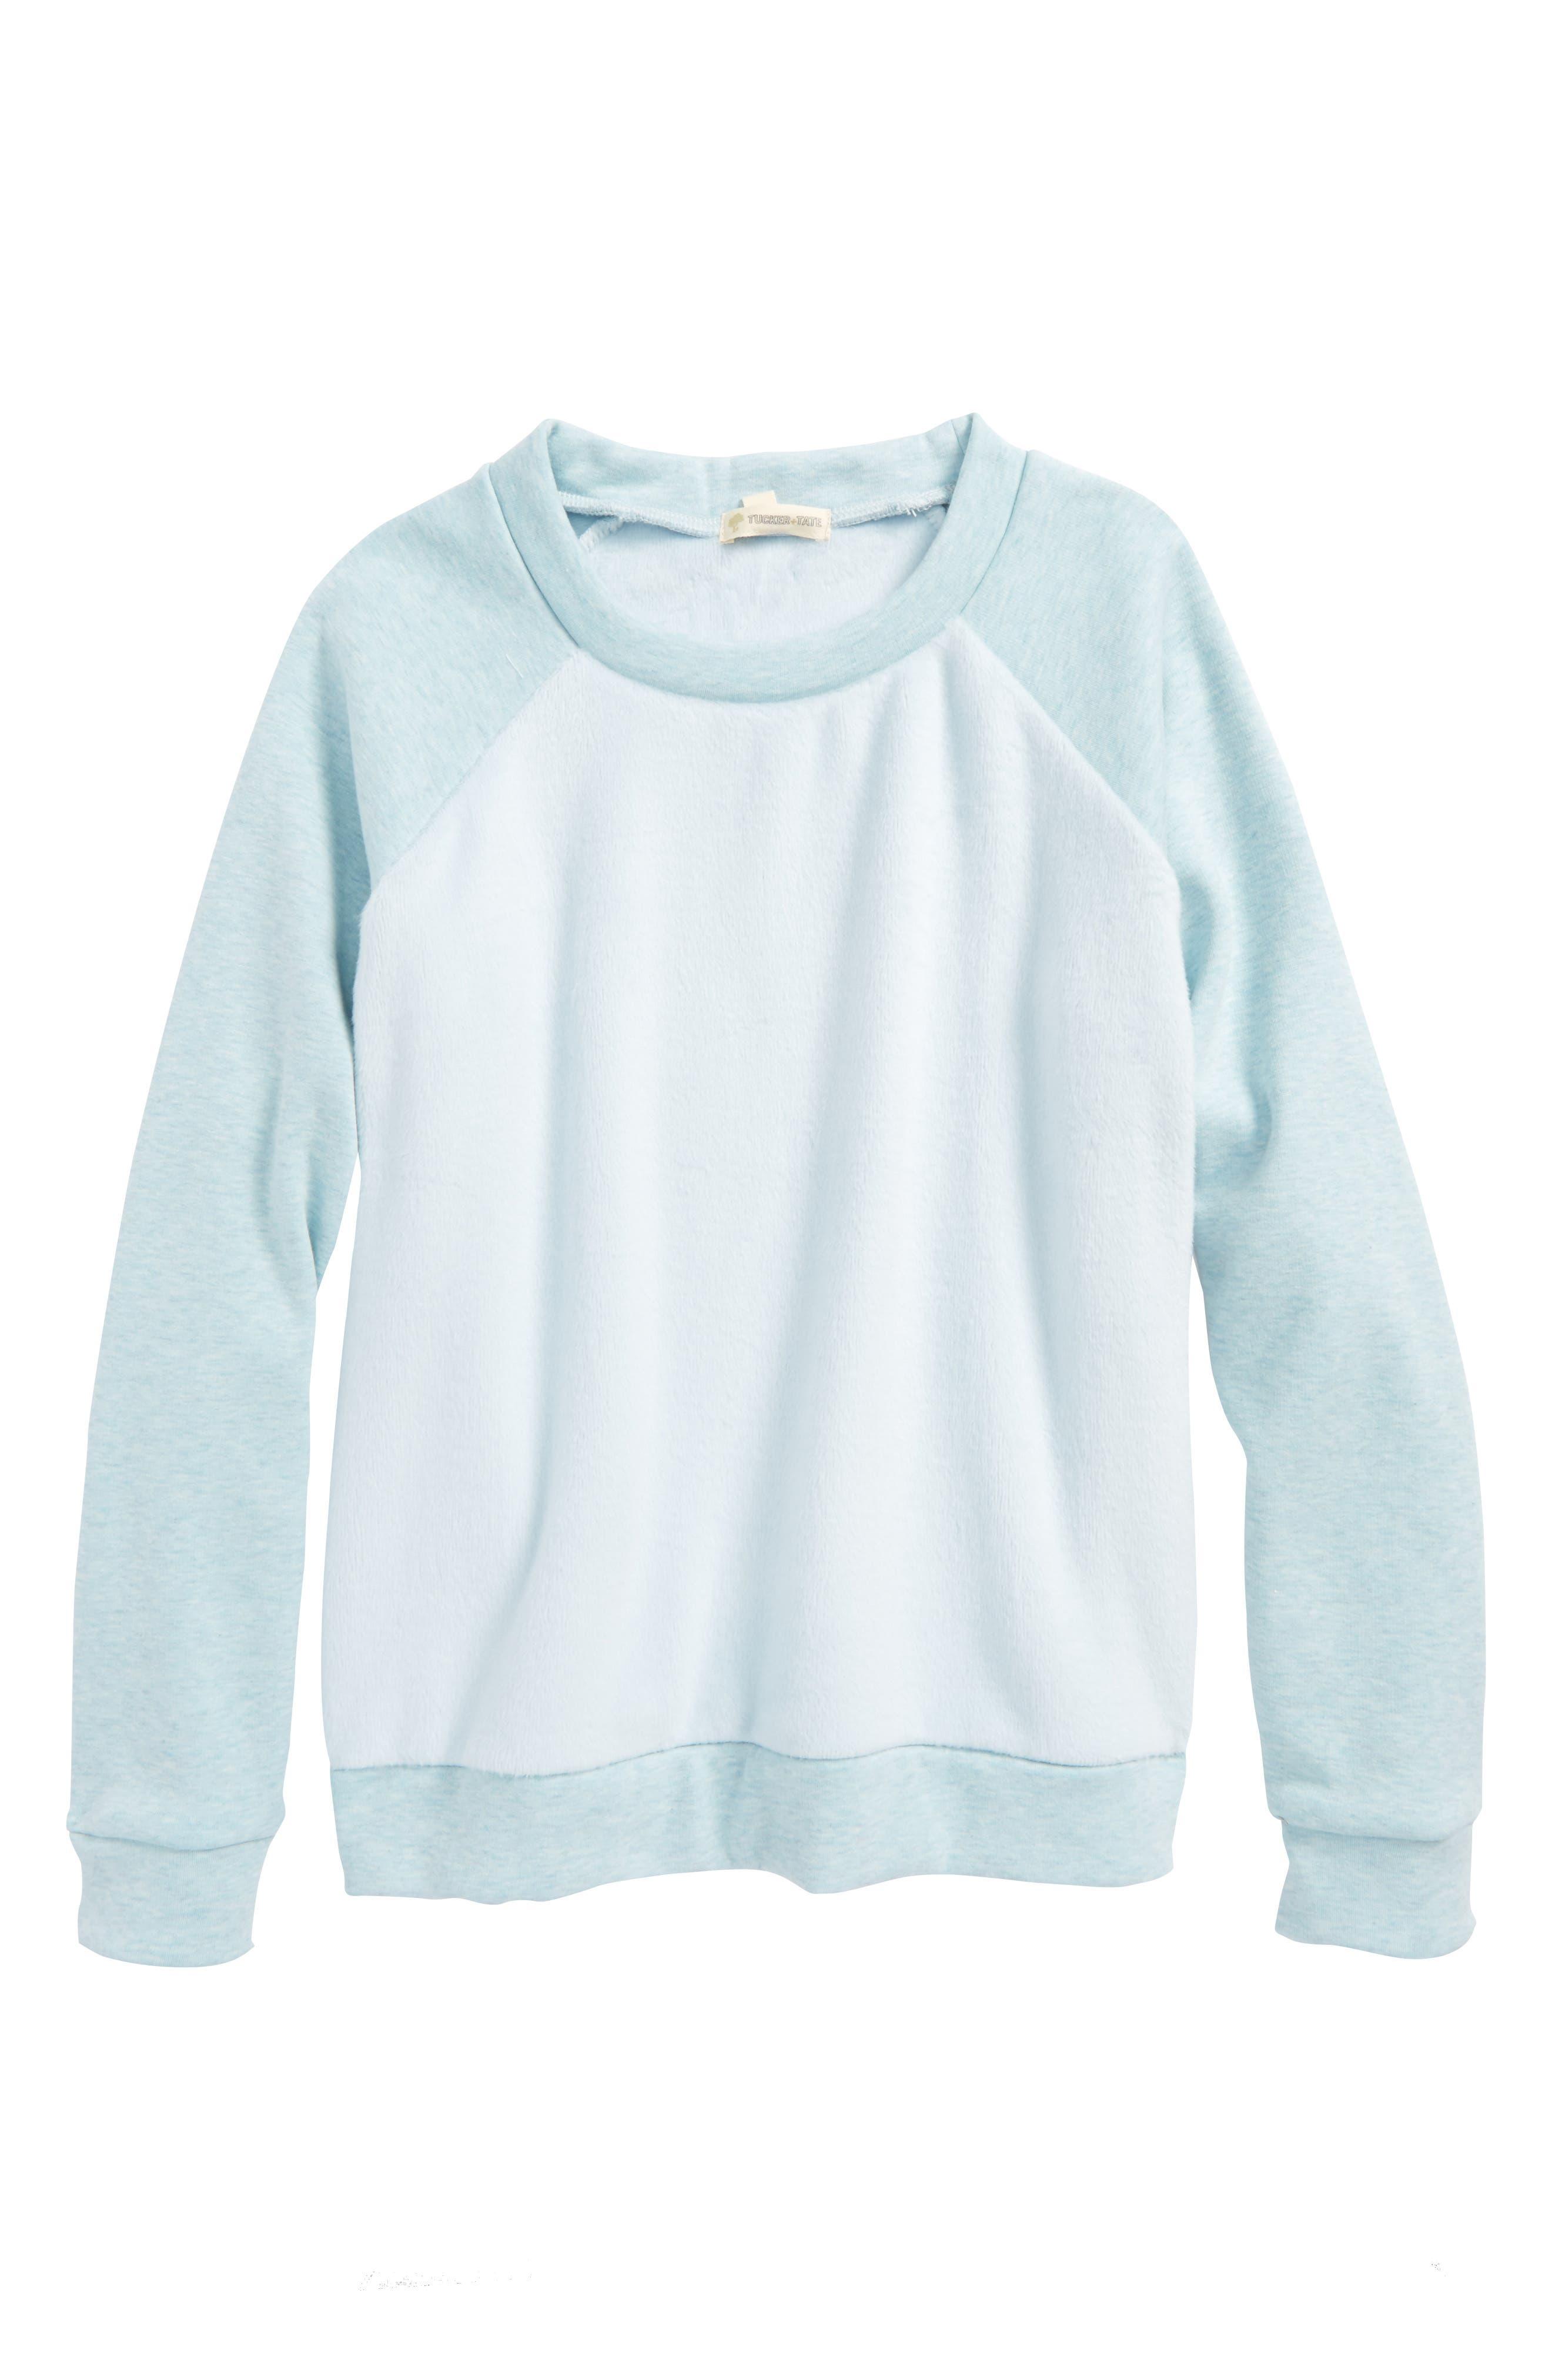 Fleece Top,                         Main,                         color,